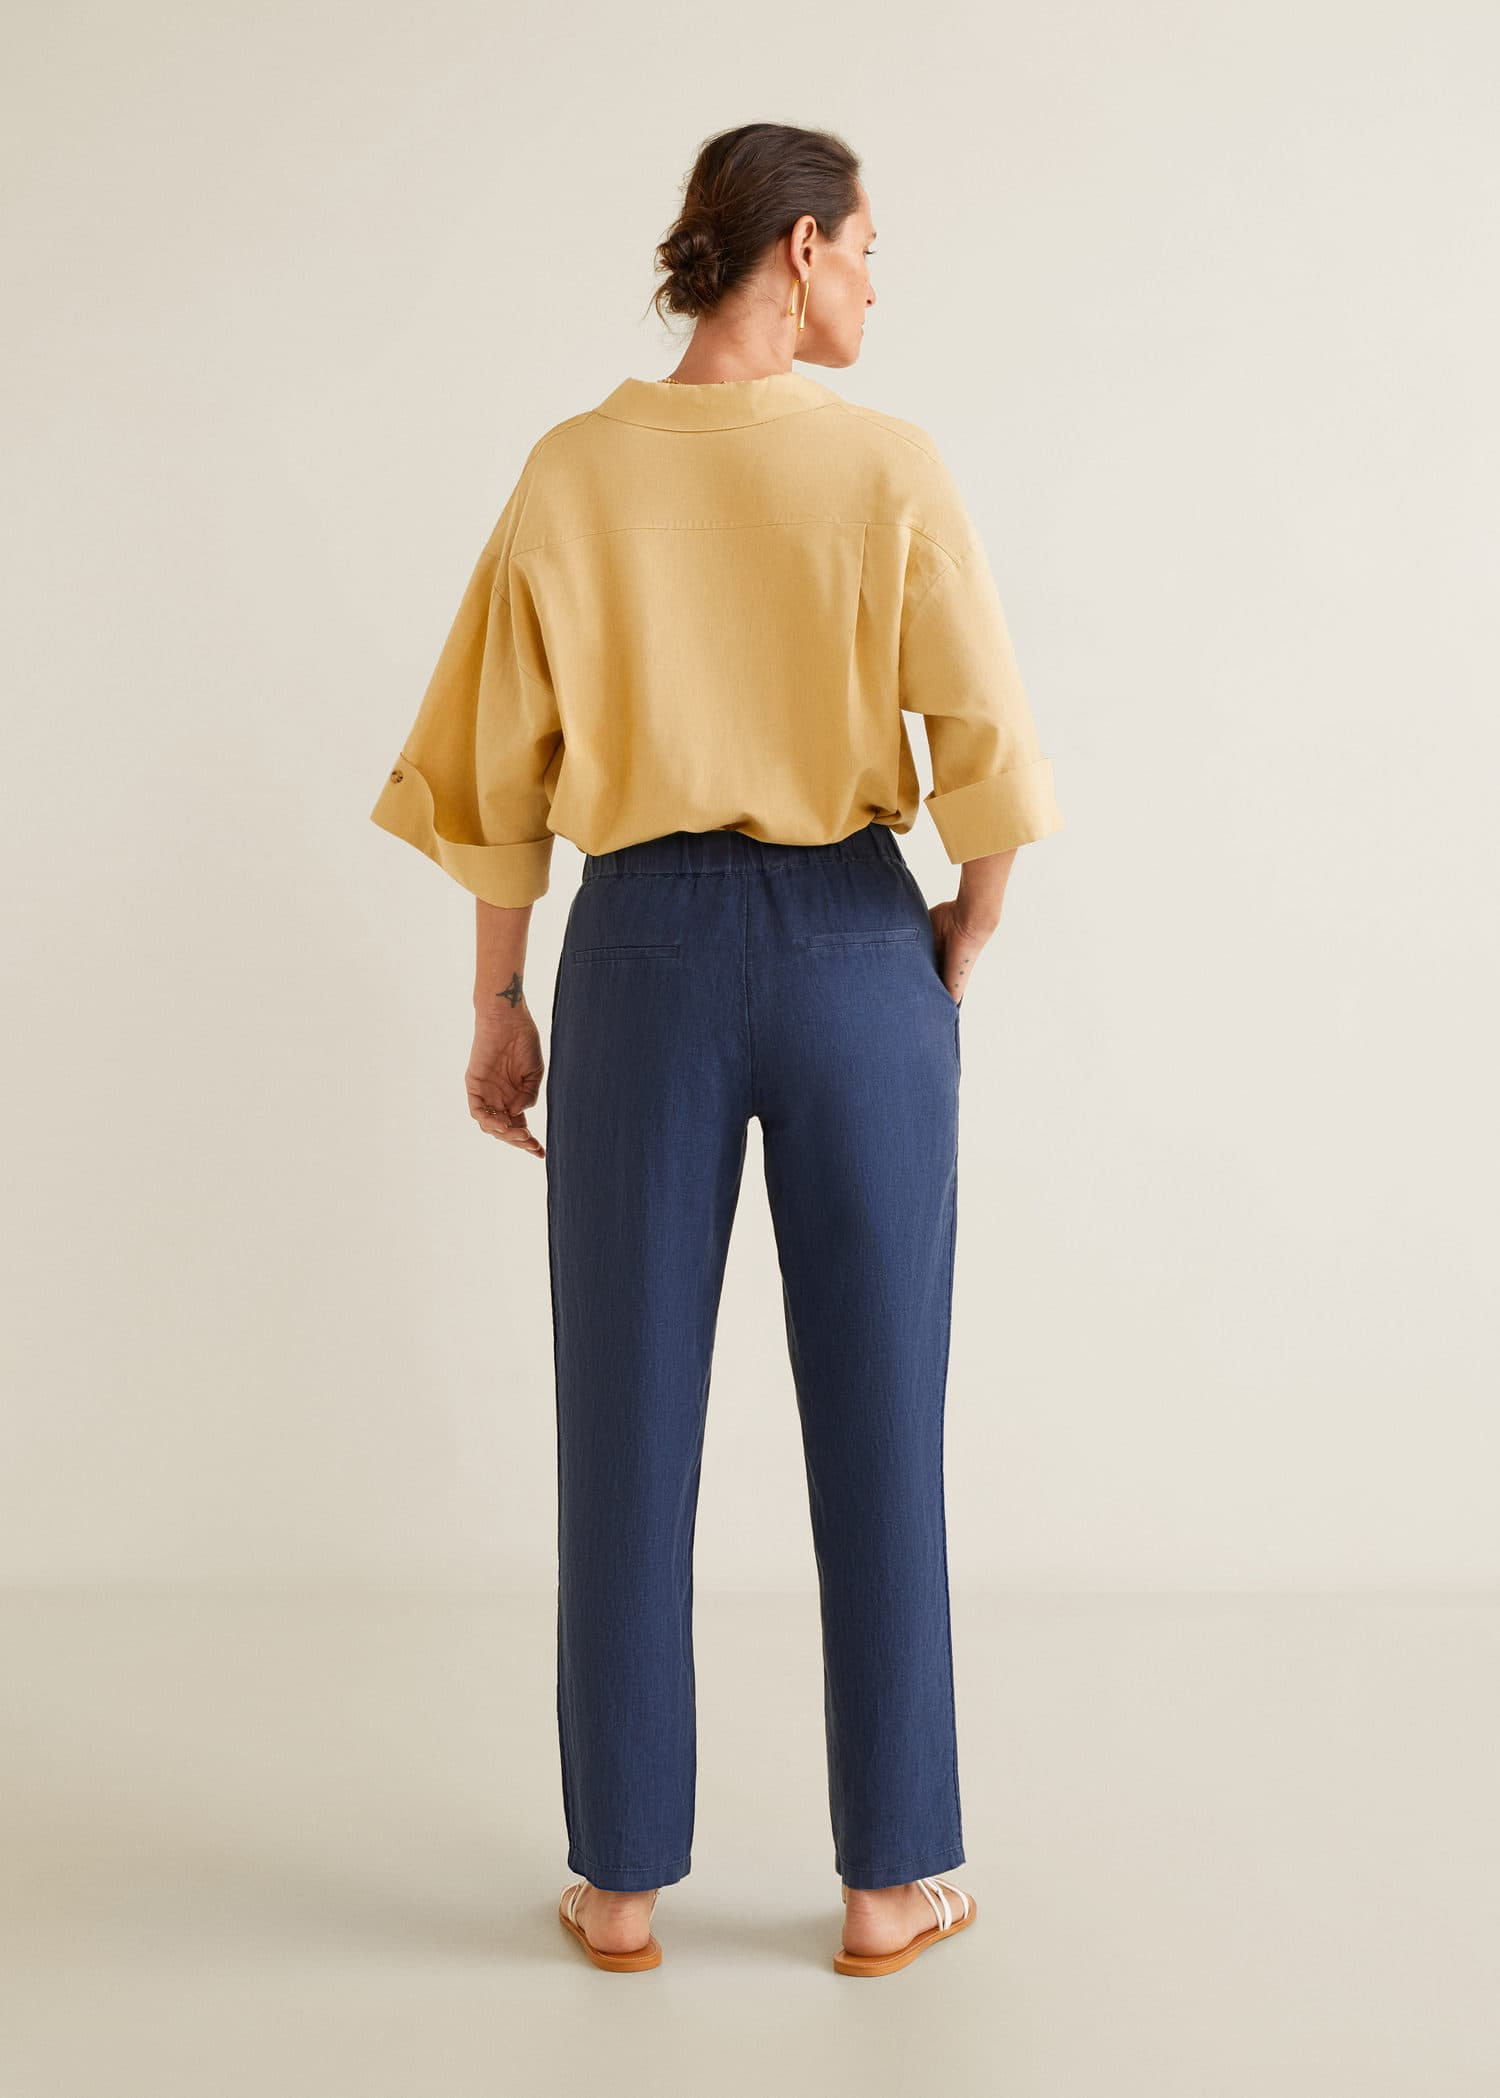 3544efa987f88 Modalite - Mango Düz kesim keten pantolon